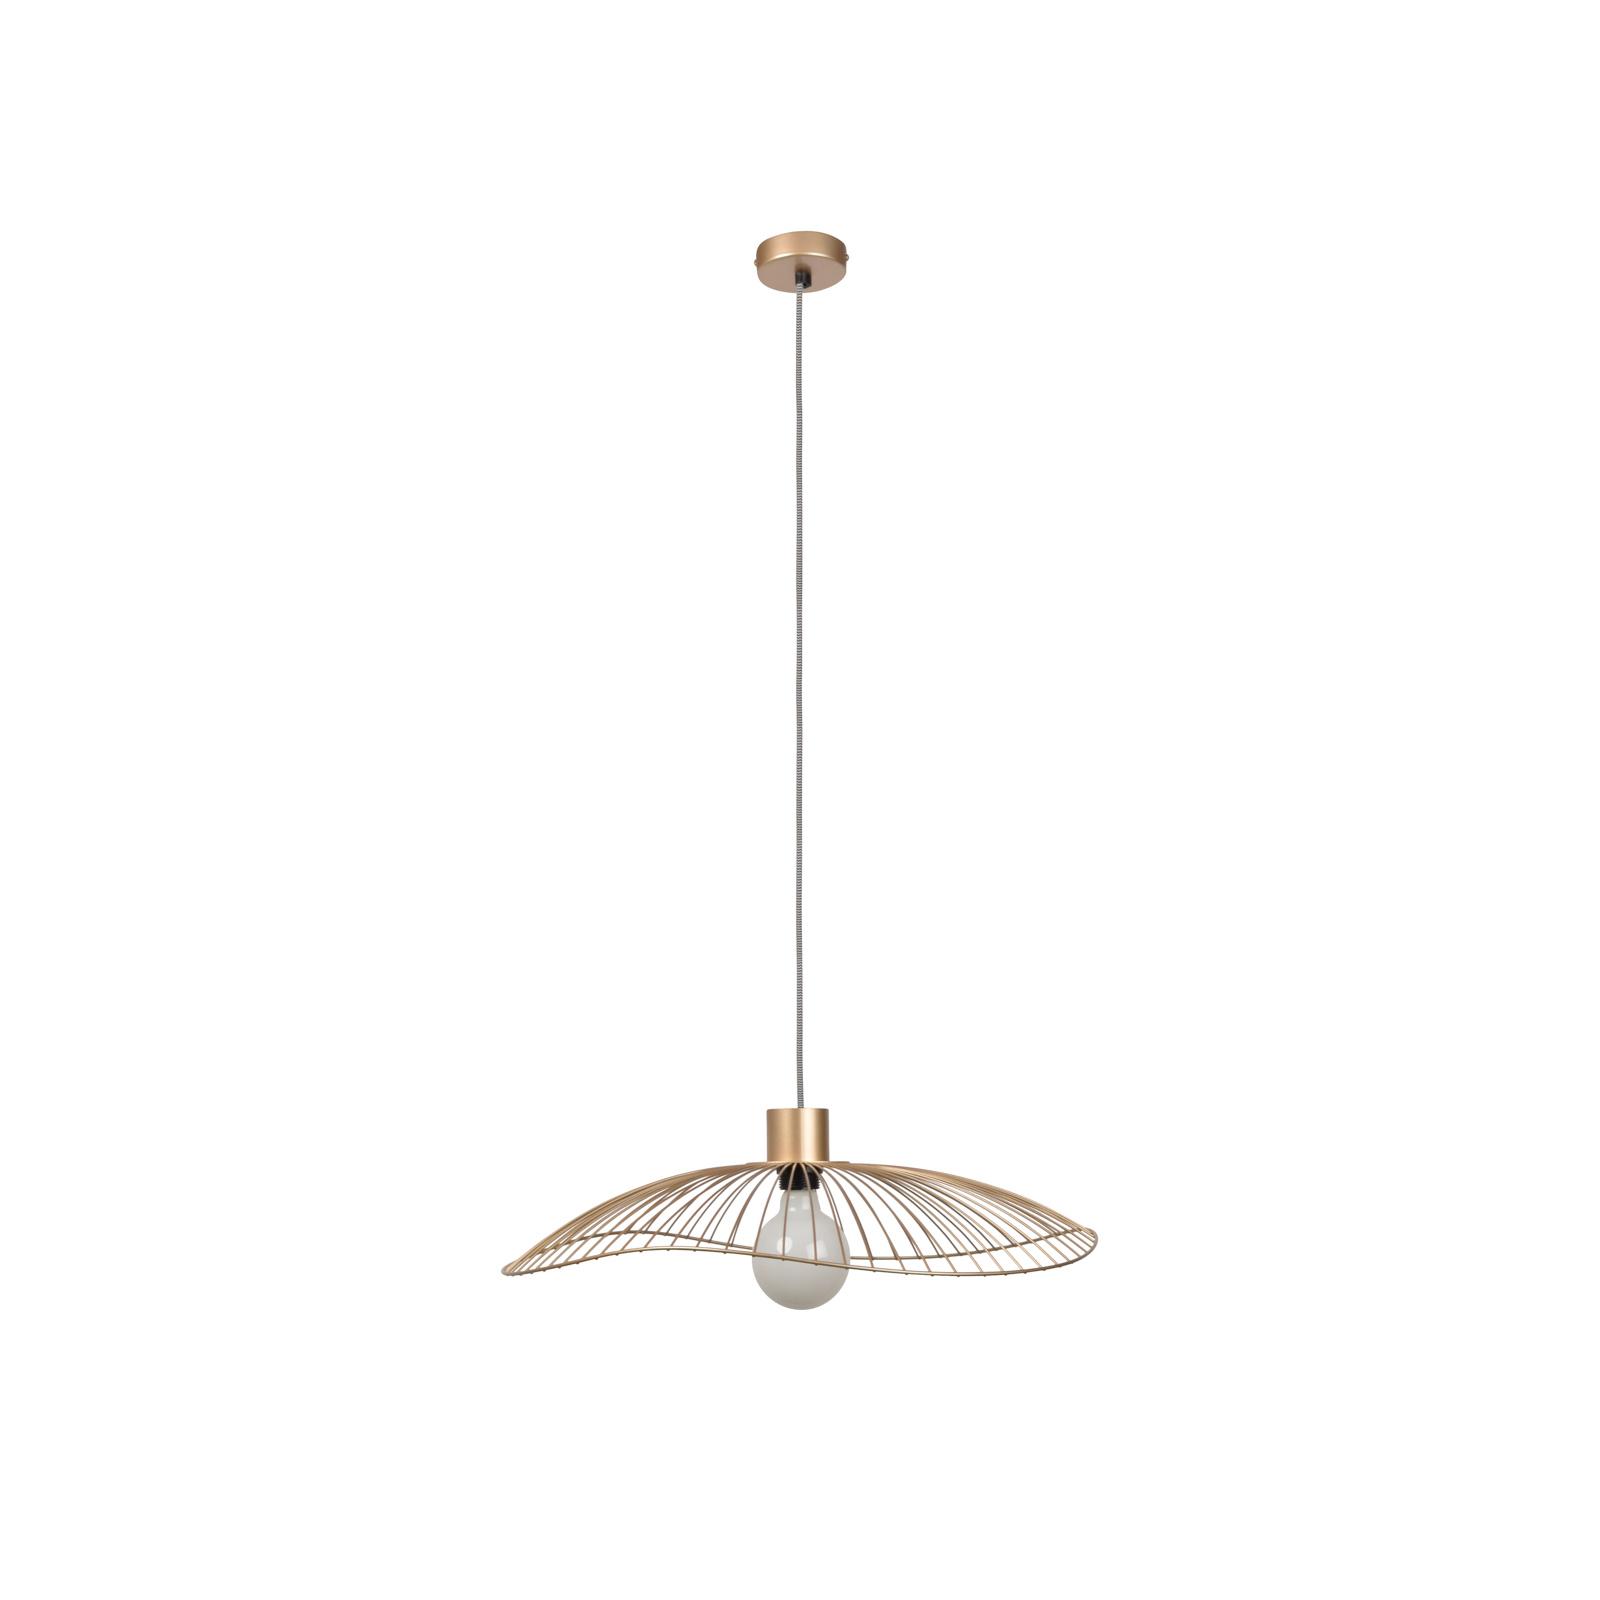 Forestier Colibri pendant lamp, dimmable_3567097_1